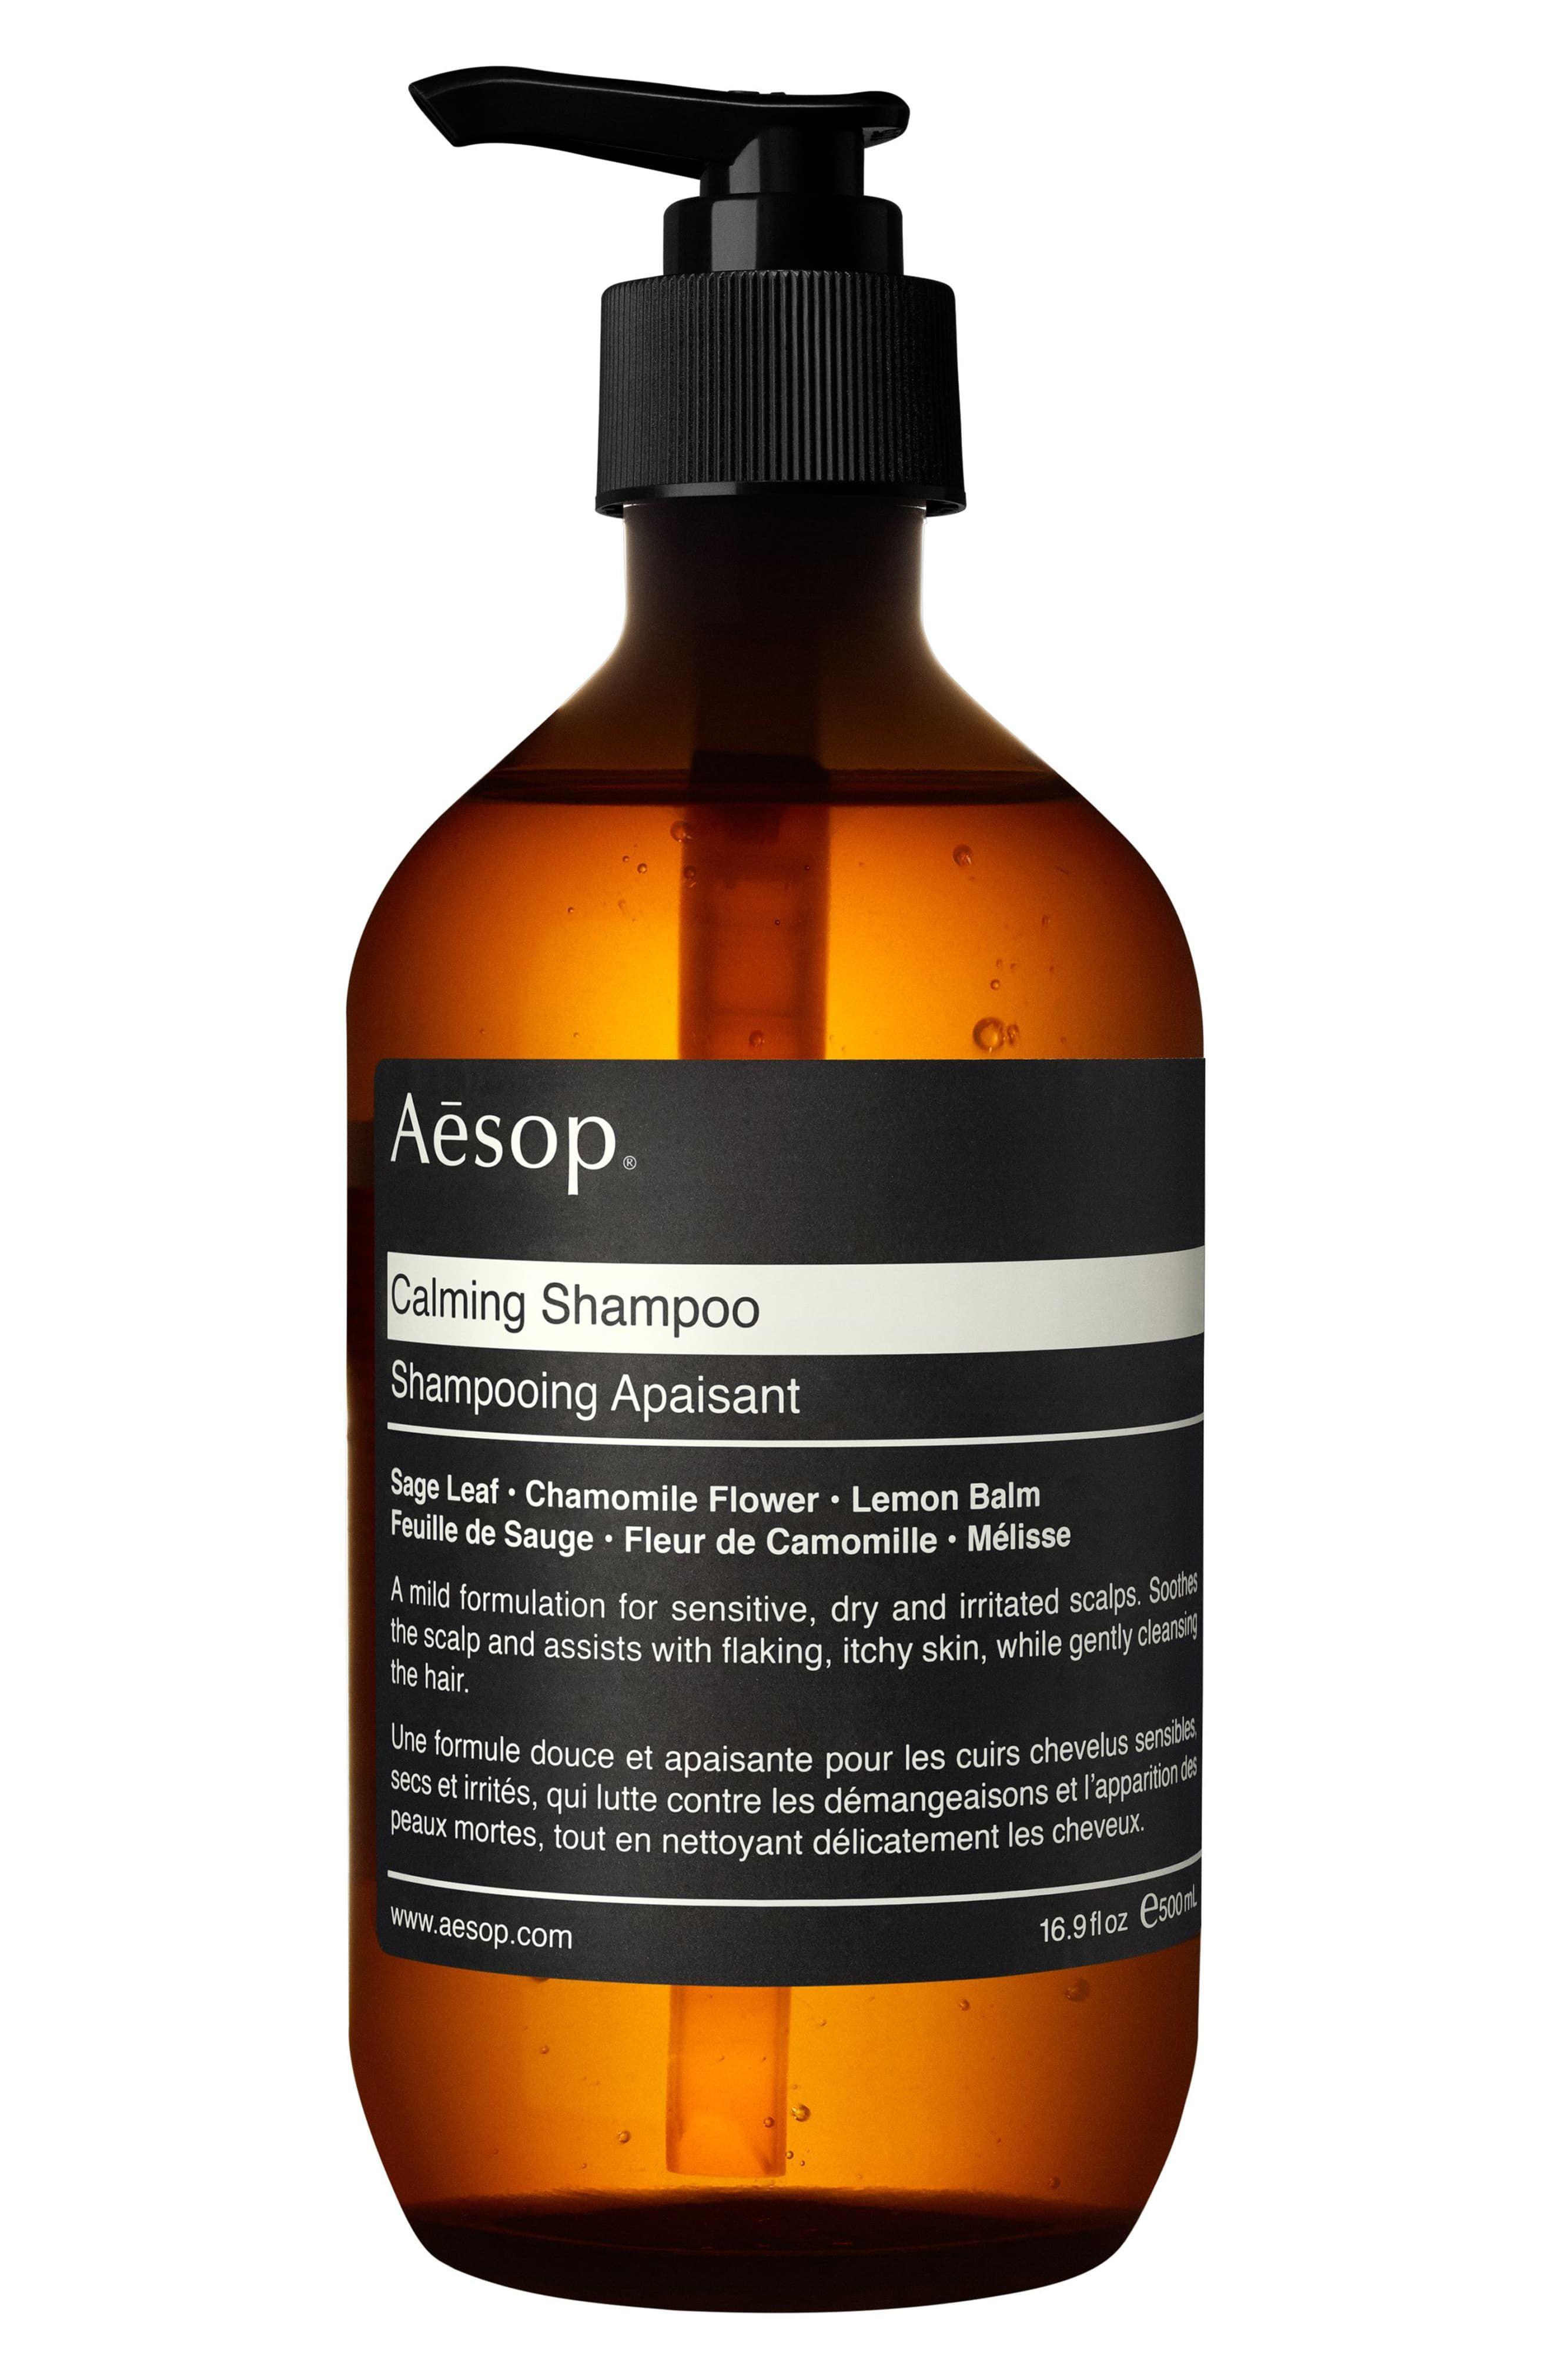 The 12 Best Shampoos for Hair Growth - Shampoo Wash for Hair Loss